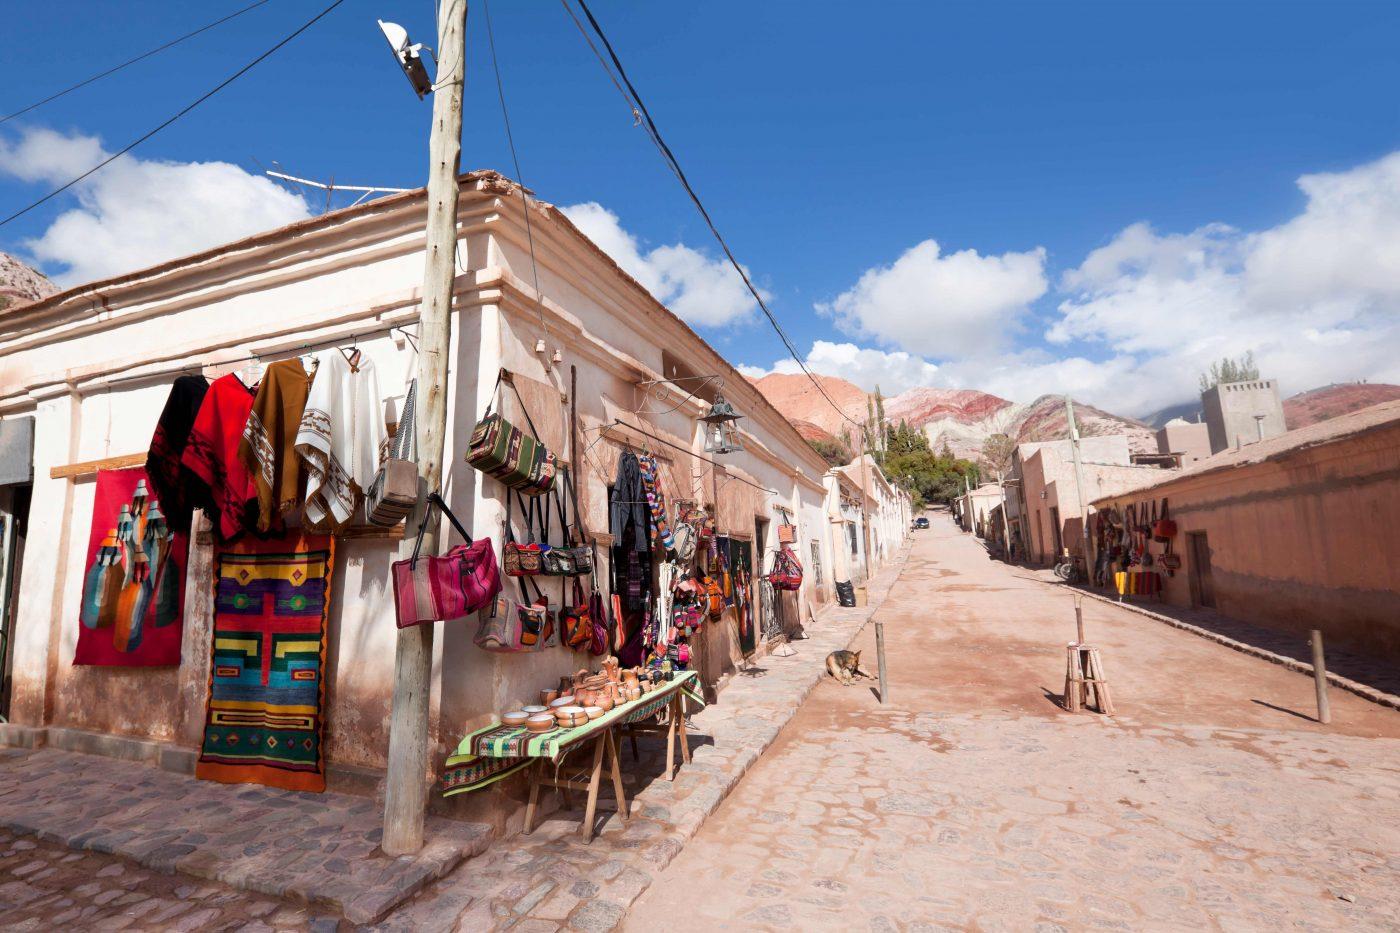 Straße im Dorf Purmamarca